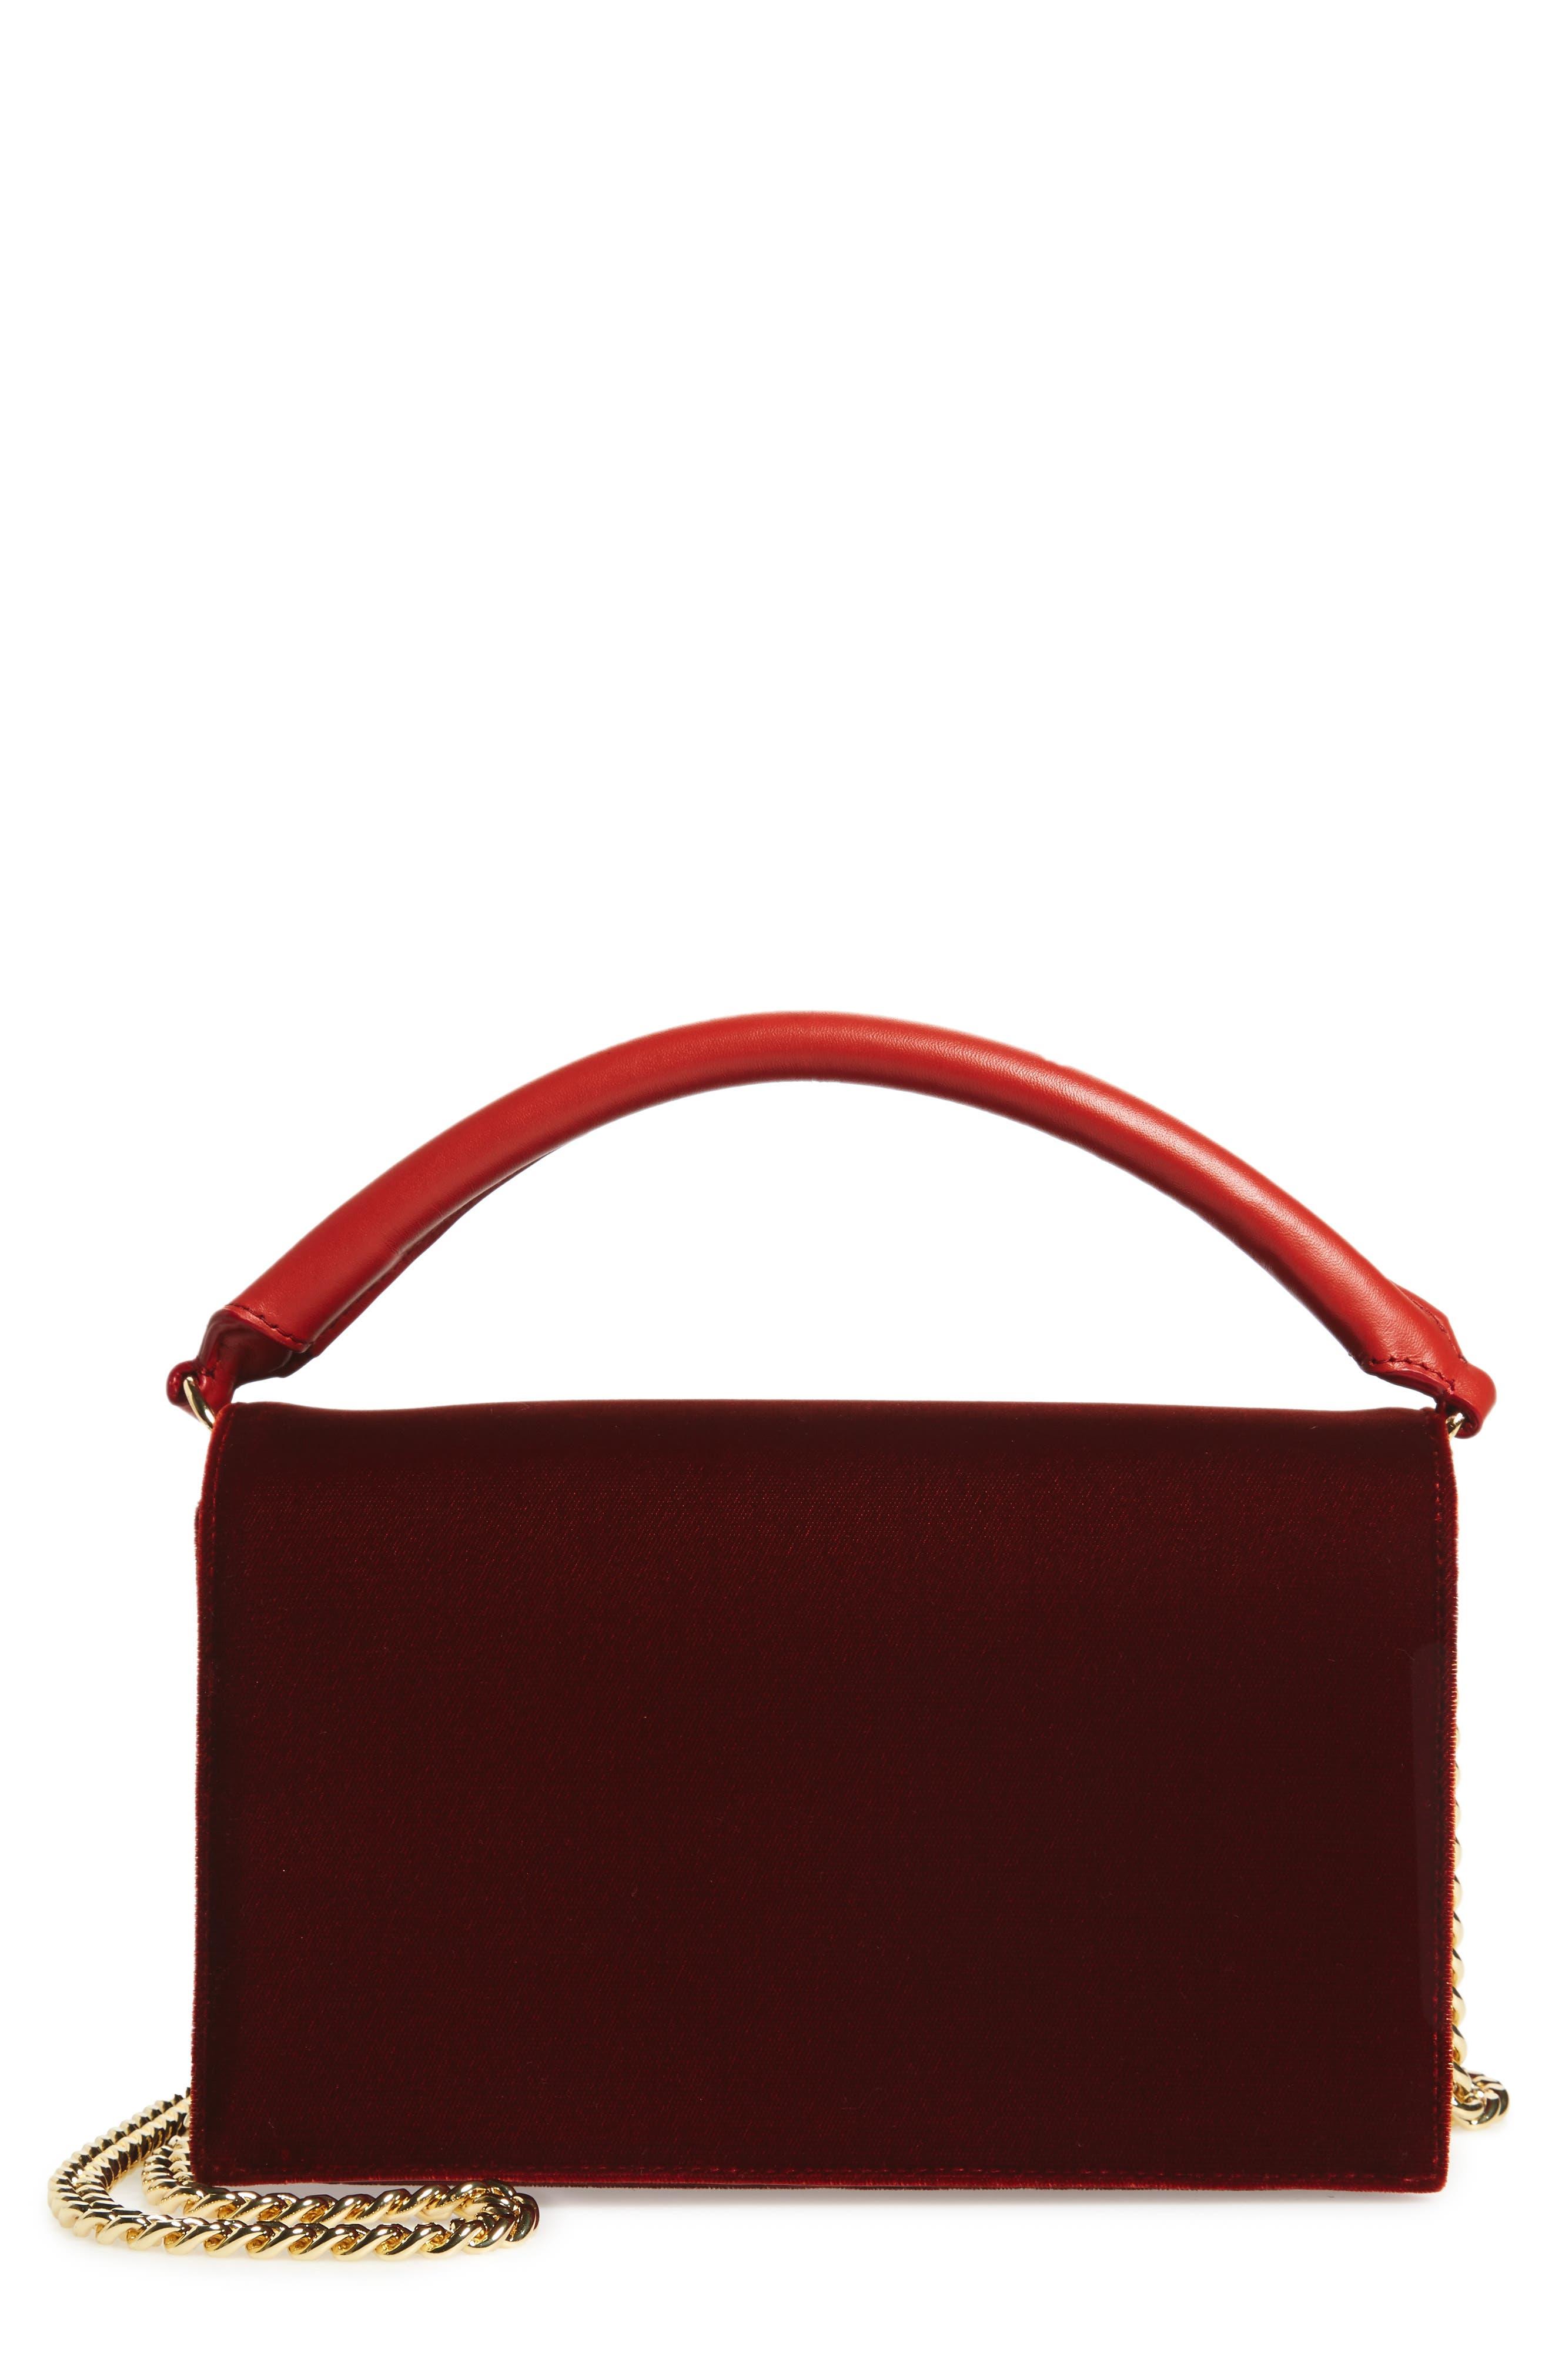 Main Image - Diane von Furstenberg Soirée Velvet Top Handle Bag